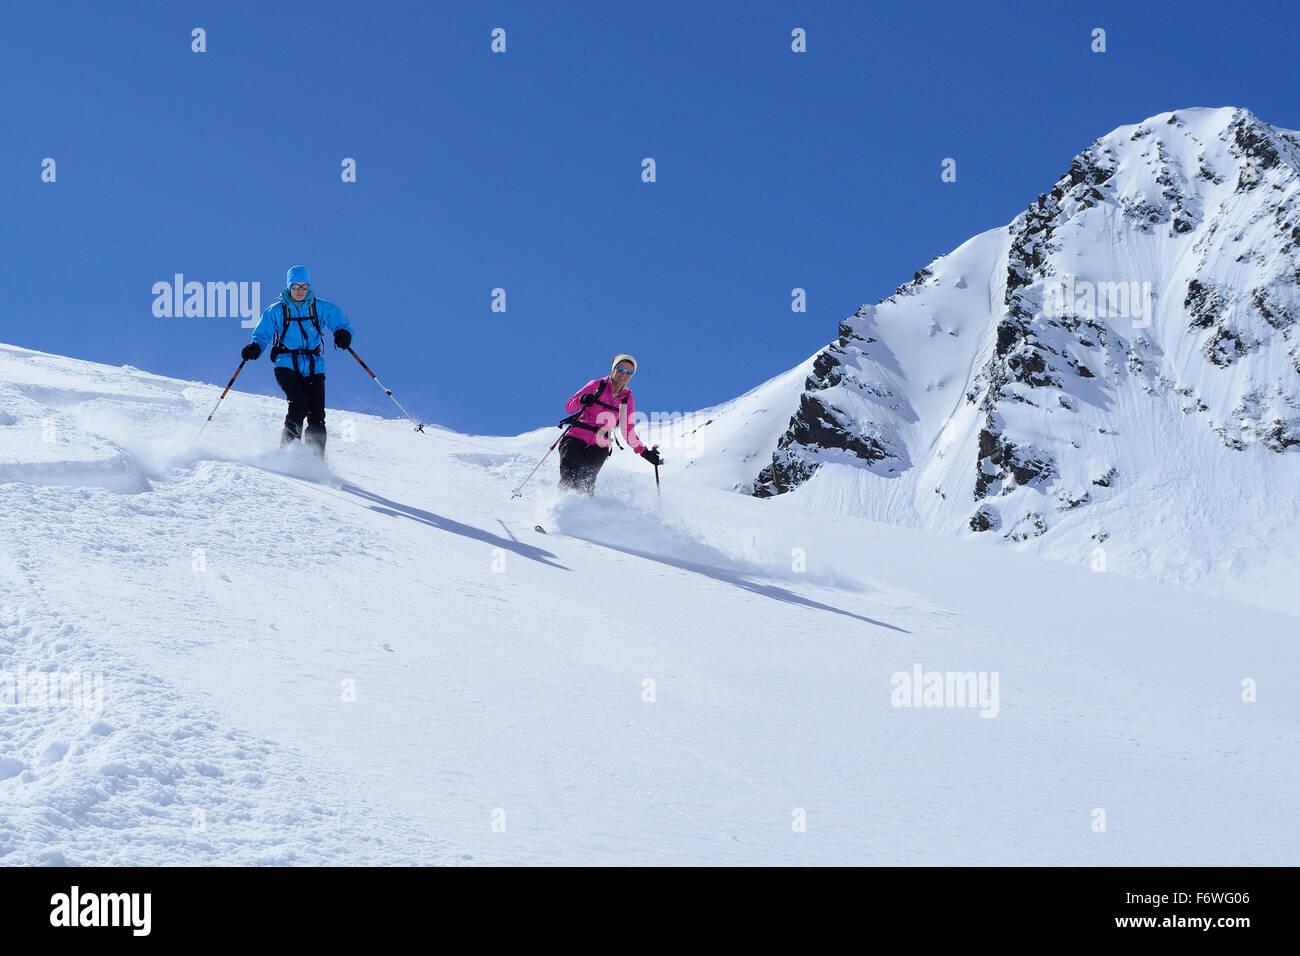 Two female backcountry skiers downhill skiing, Gleirscher Rosskogel, Pforzheim Hut, Sellrain, Stubai Alps, Tyrol, - Stock Image